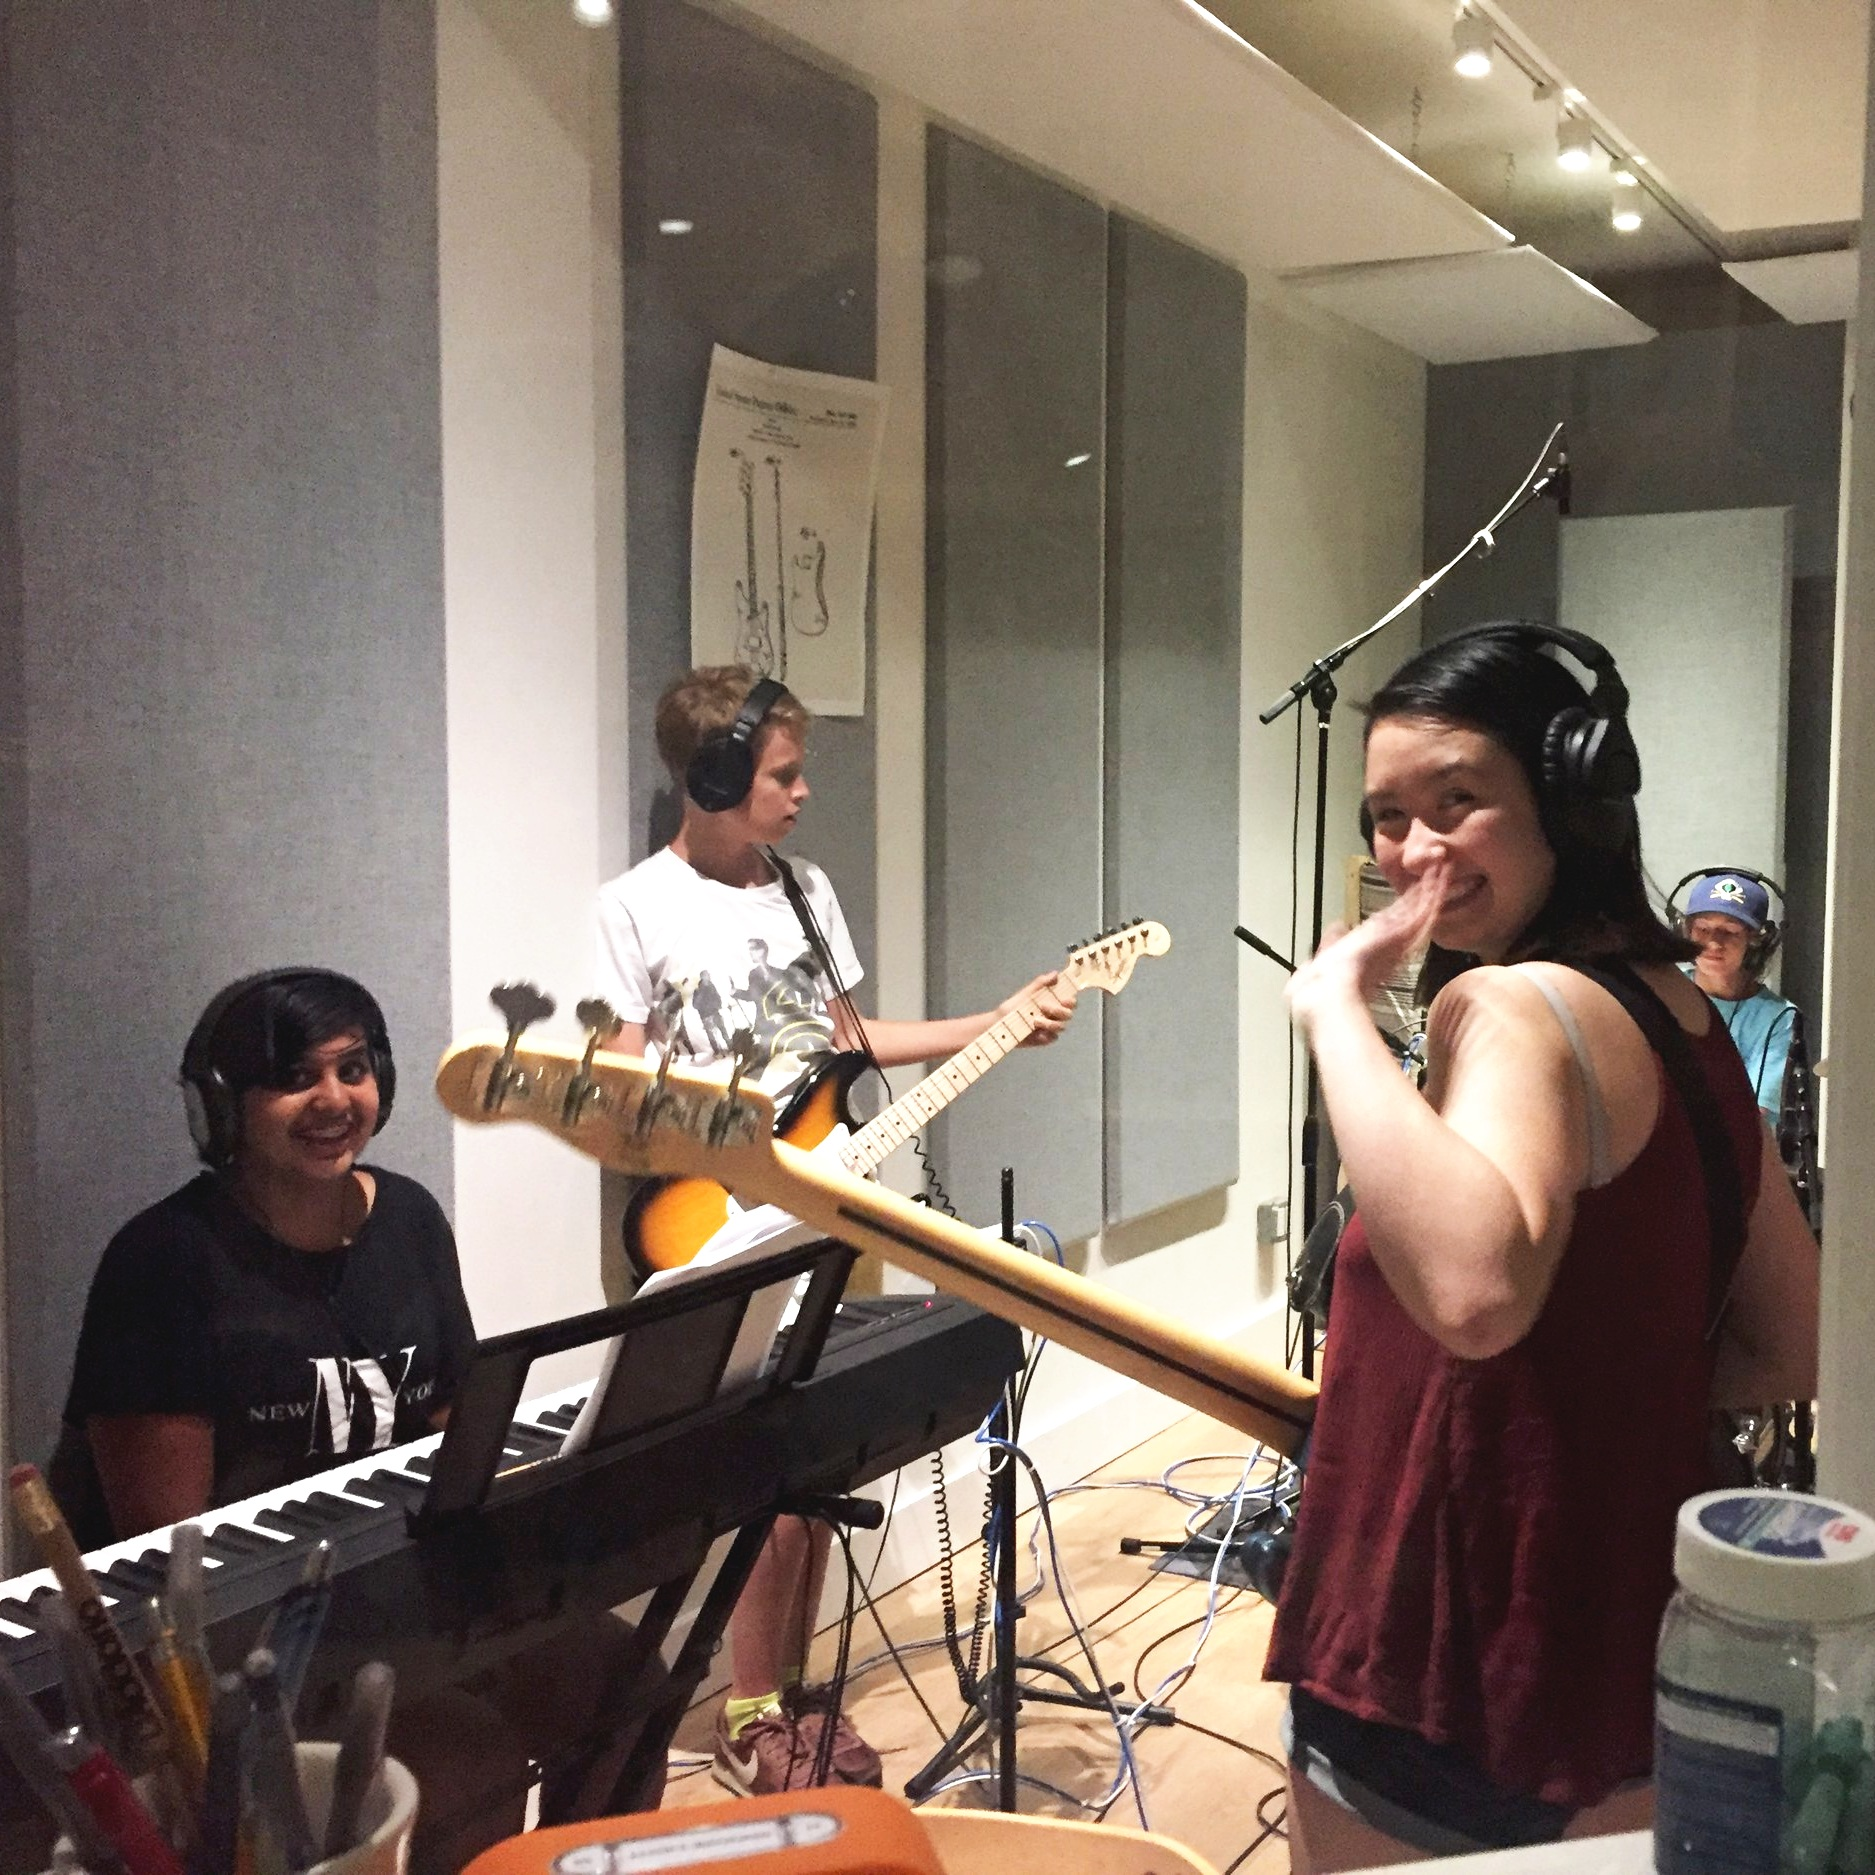 band+practice.jpg